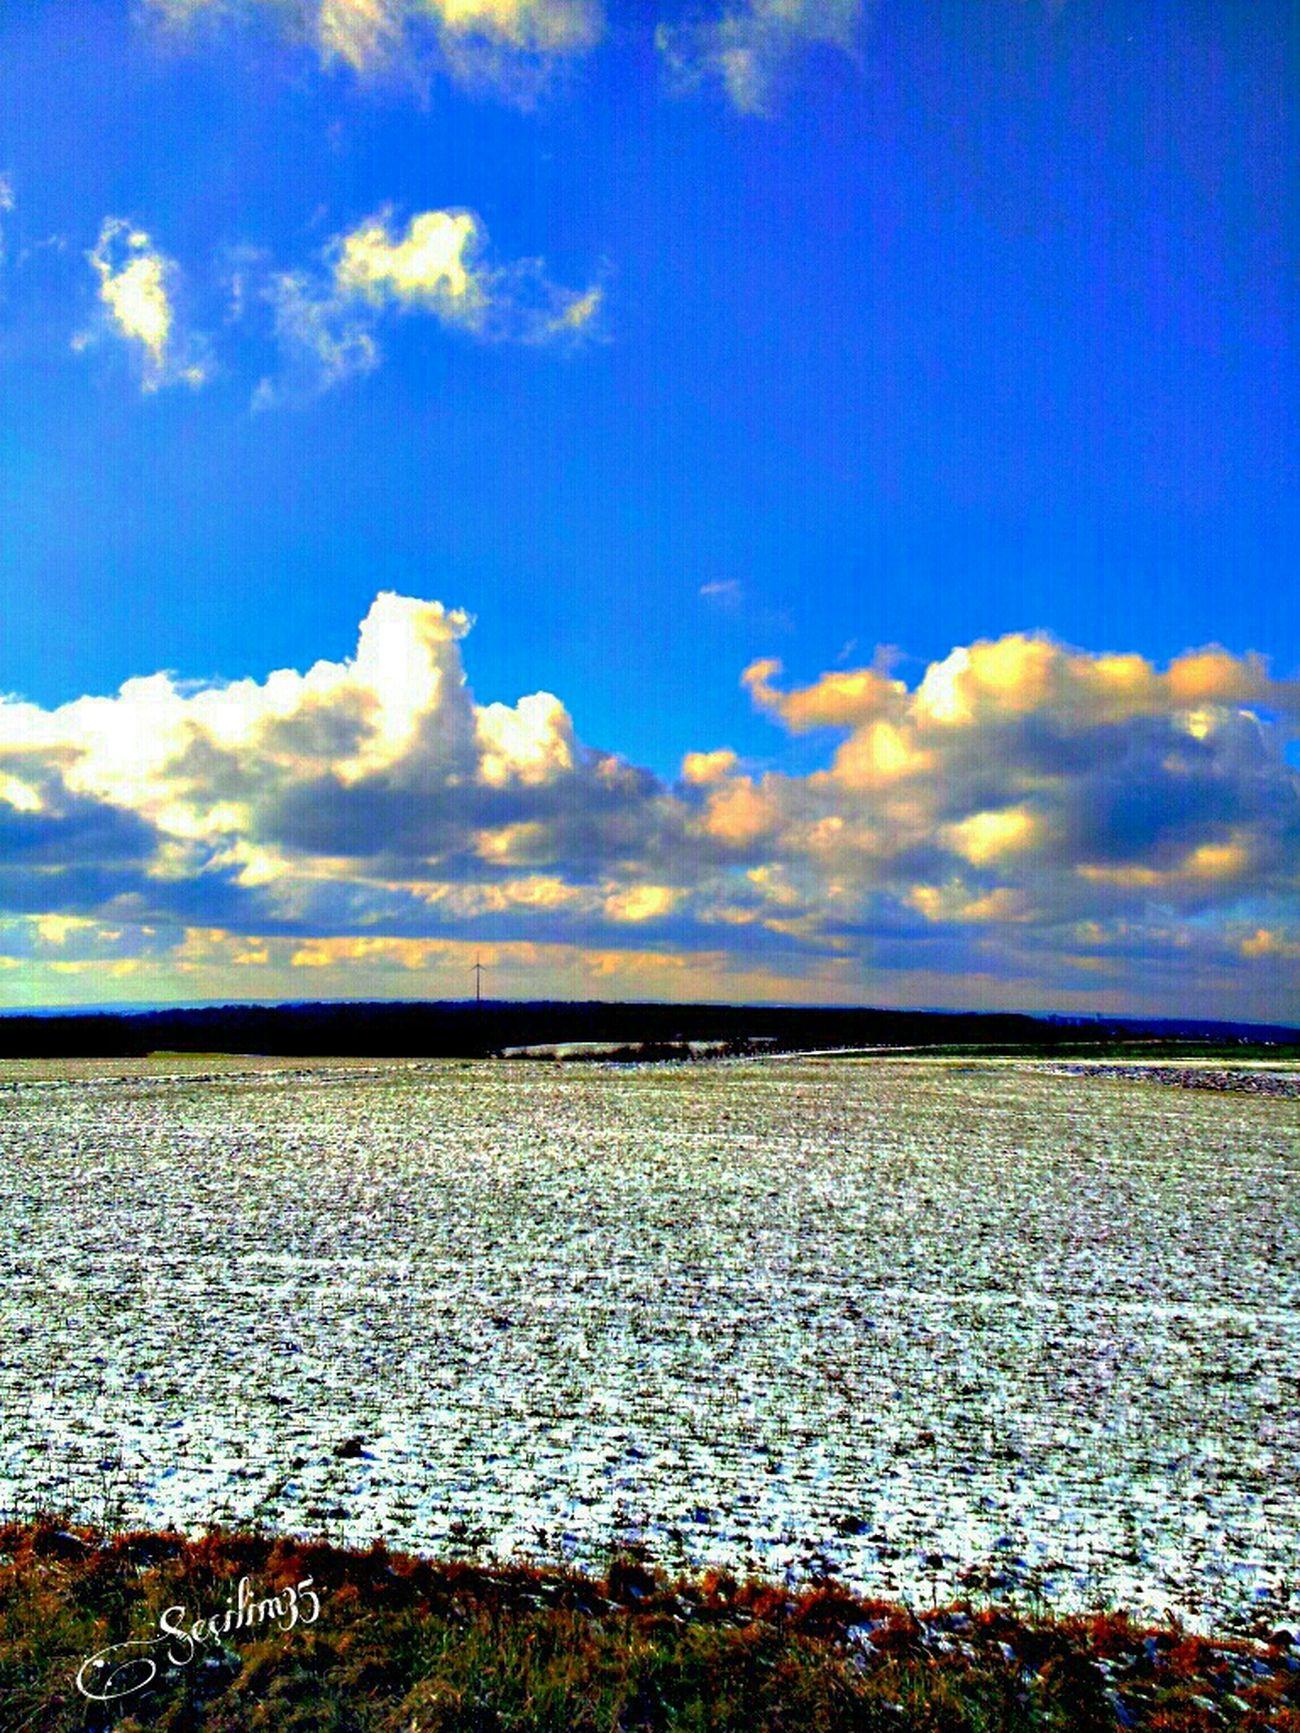 Cem Karaca-Sevda Ku§un Kanadinda Happy Weekend :) Sunset Enjoying The View Blue Germany Clouds And Sky Sky_collection Sun_collection Nature_collection